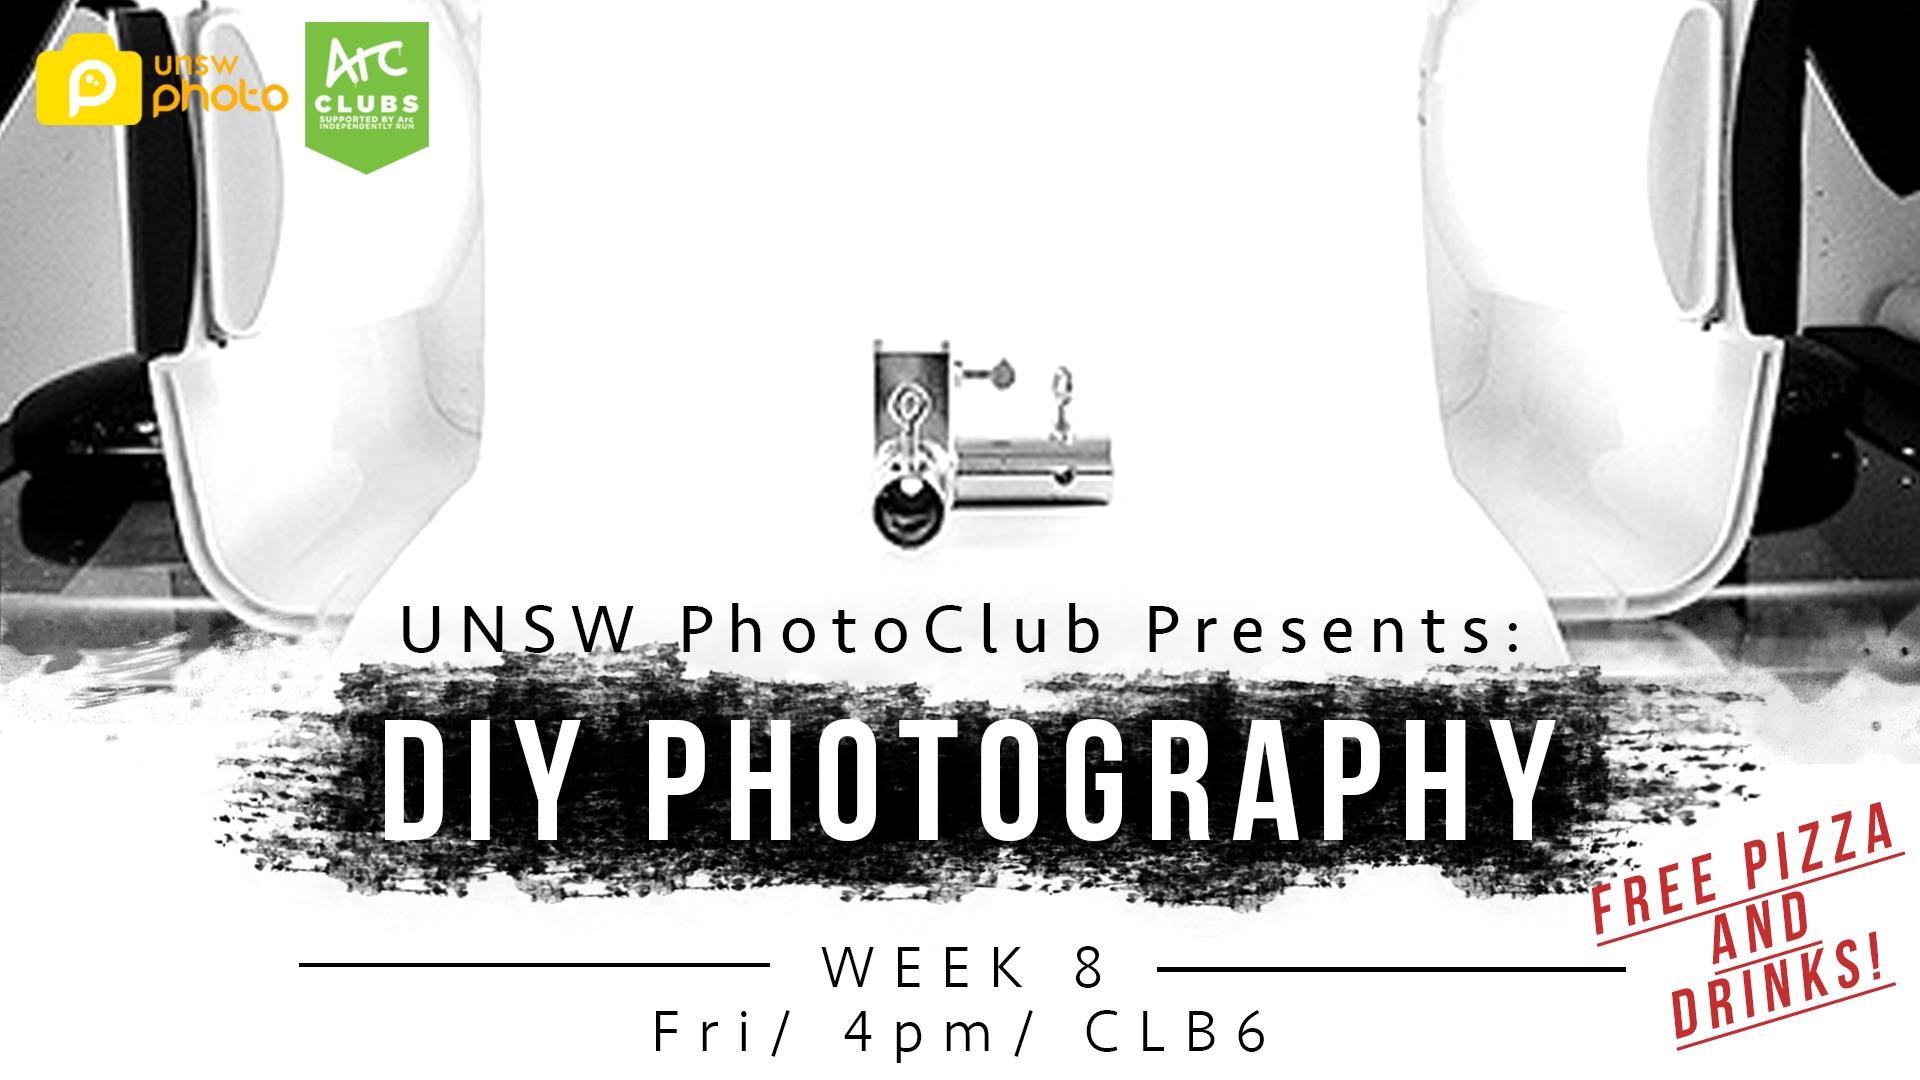 Week 8 DIY Photography